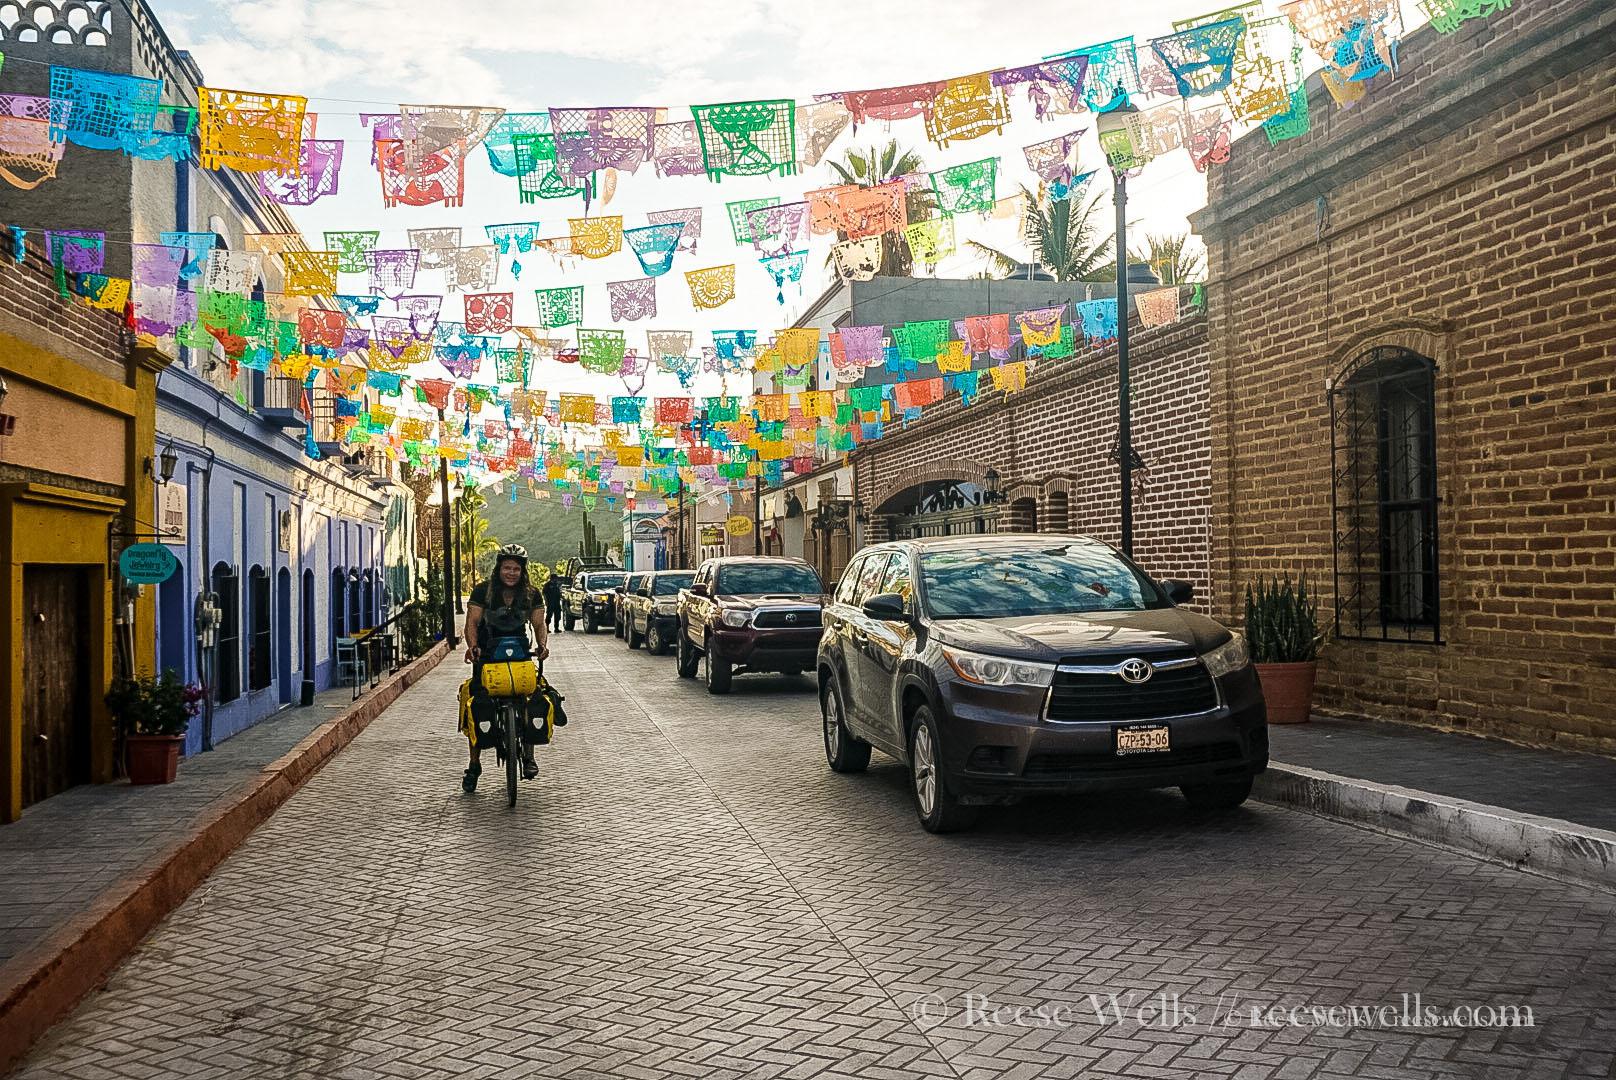 Todos Santos, Baja Sur. A vibrant community on a beautiful street.